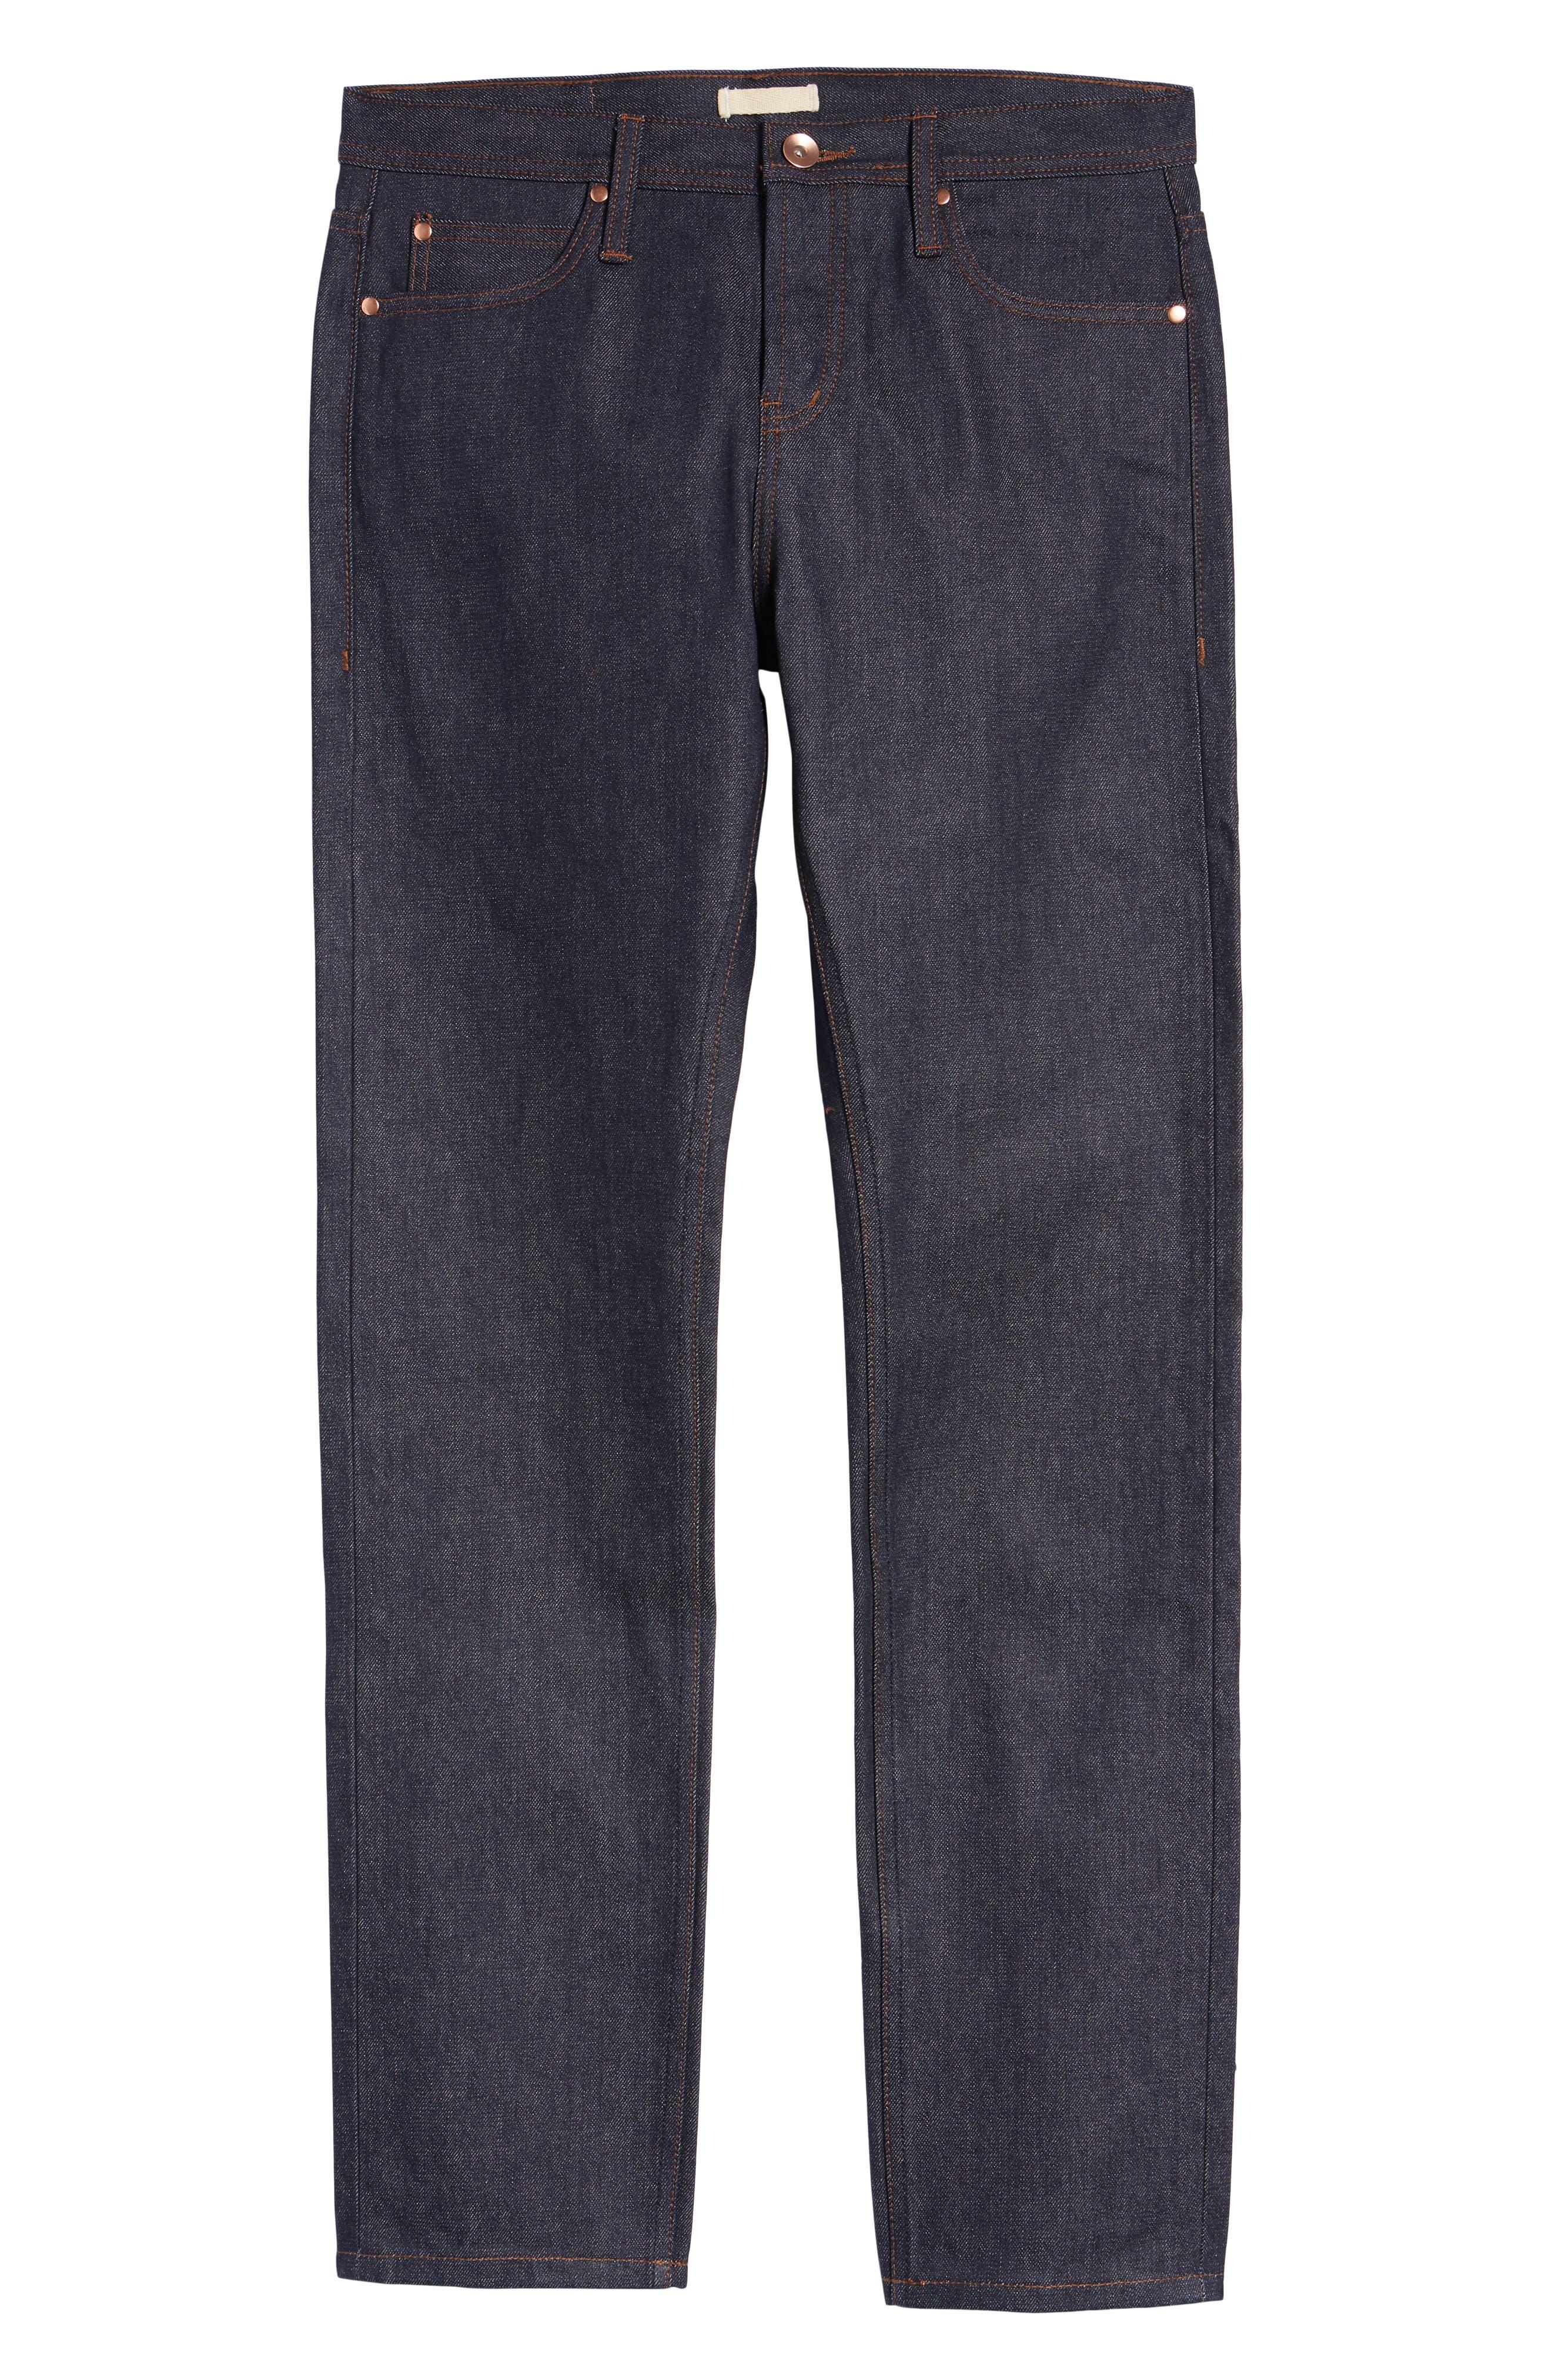 UB101 Skinny Fit Raw Selvedge Jeans,                             Alternate thumbnail 2, color,                             INDIGO